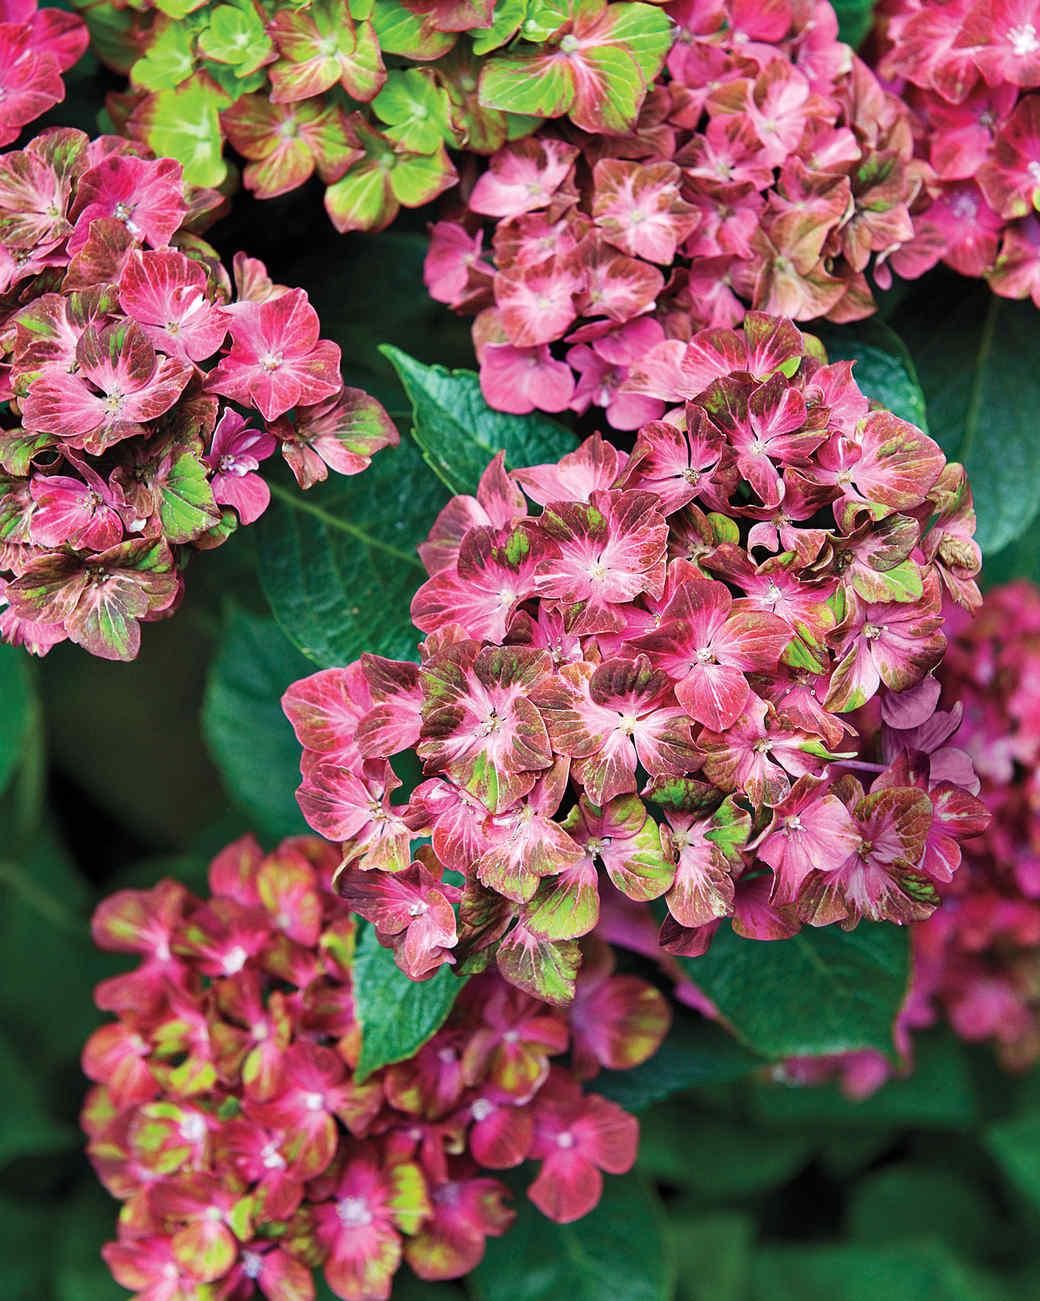 heckler-hydrangea-garden-522173aj-dsc6213-s111010.jpg